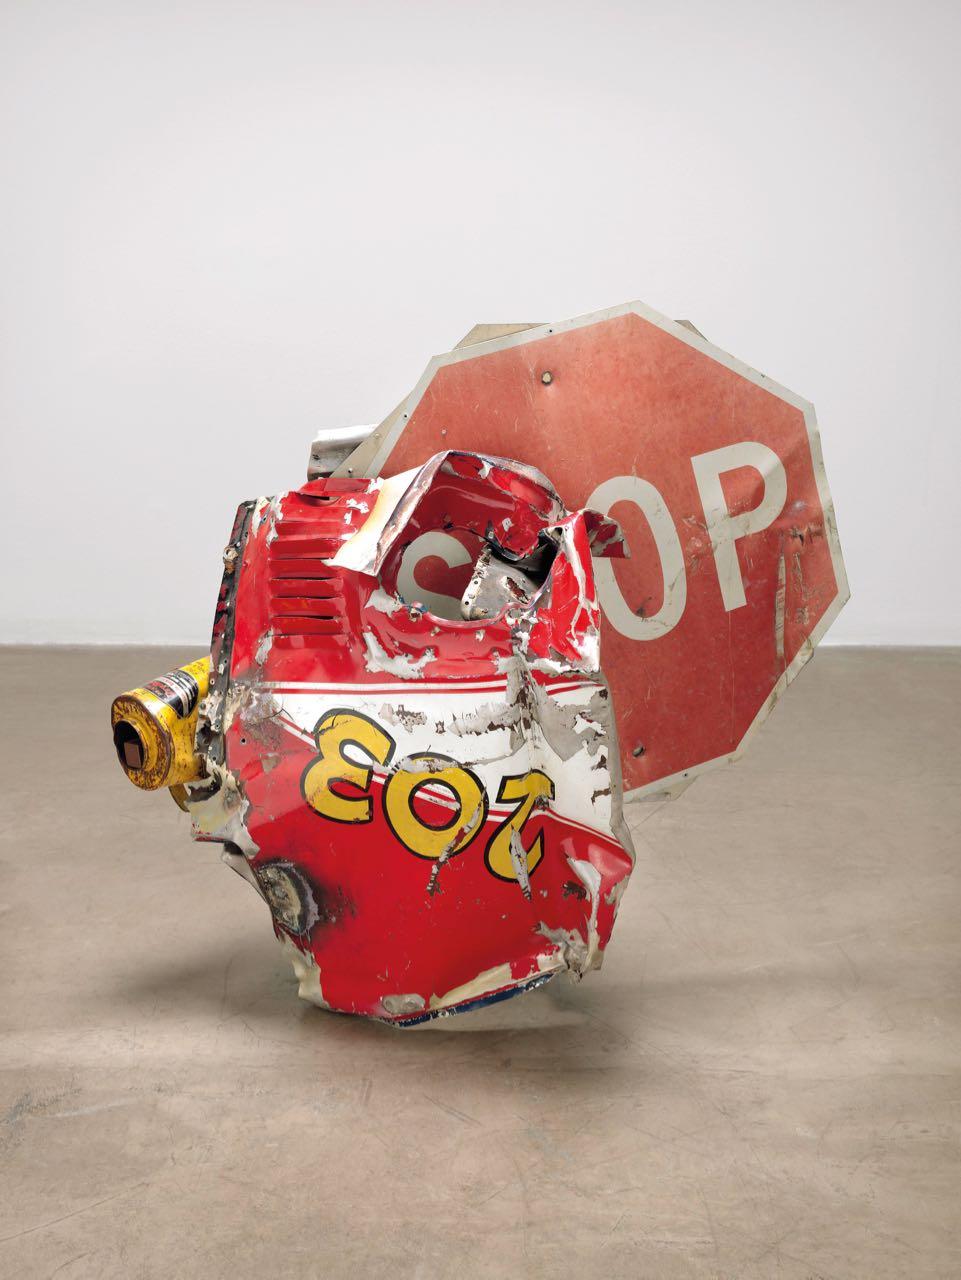 Robert Rauschenberg at Tate Modern - culture - Tate Modern, StyleZeitgeist, Robert Rauschenberg, Rauschenberg, London, Exhibition, Exhibit, Art, 2016